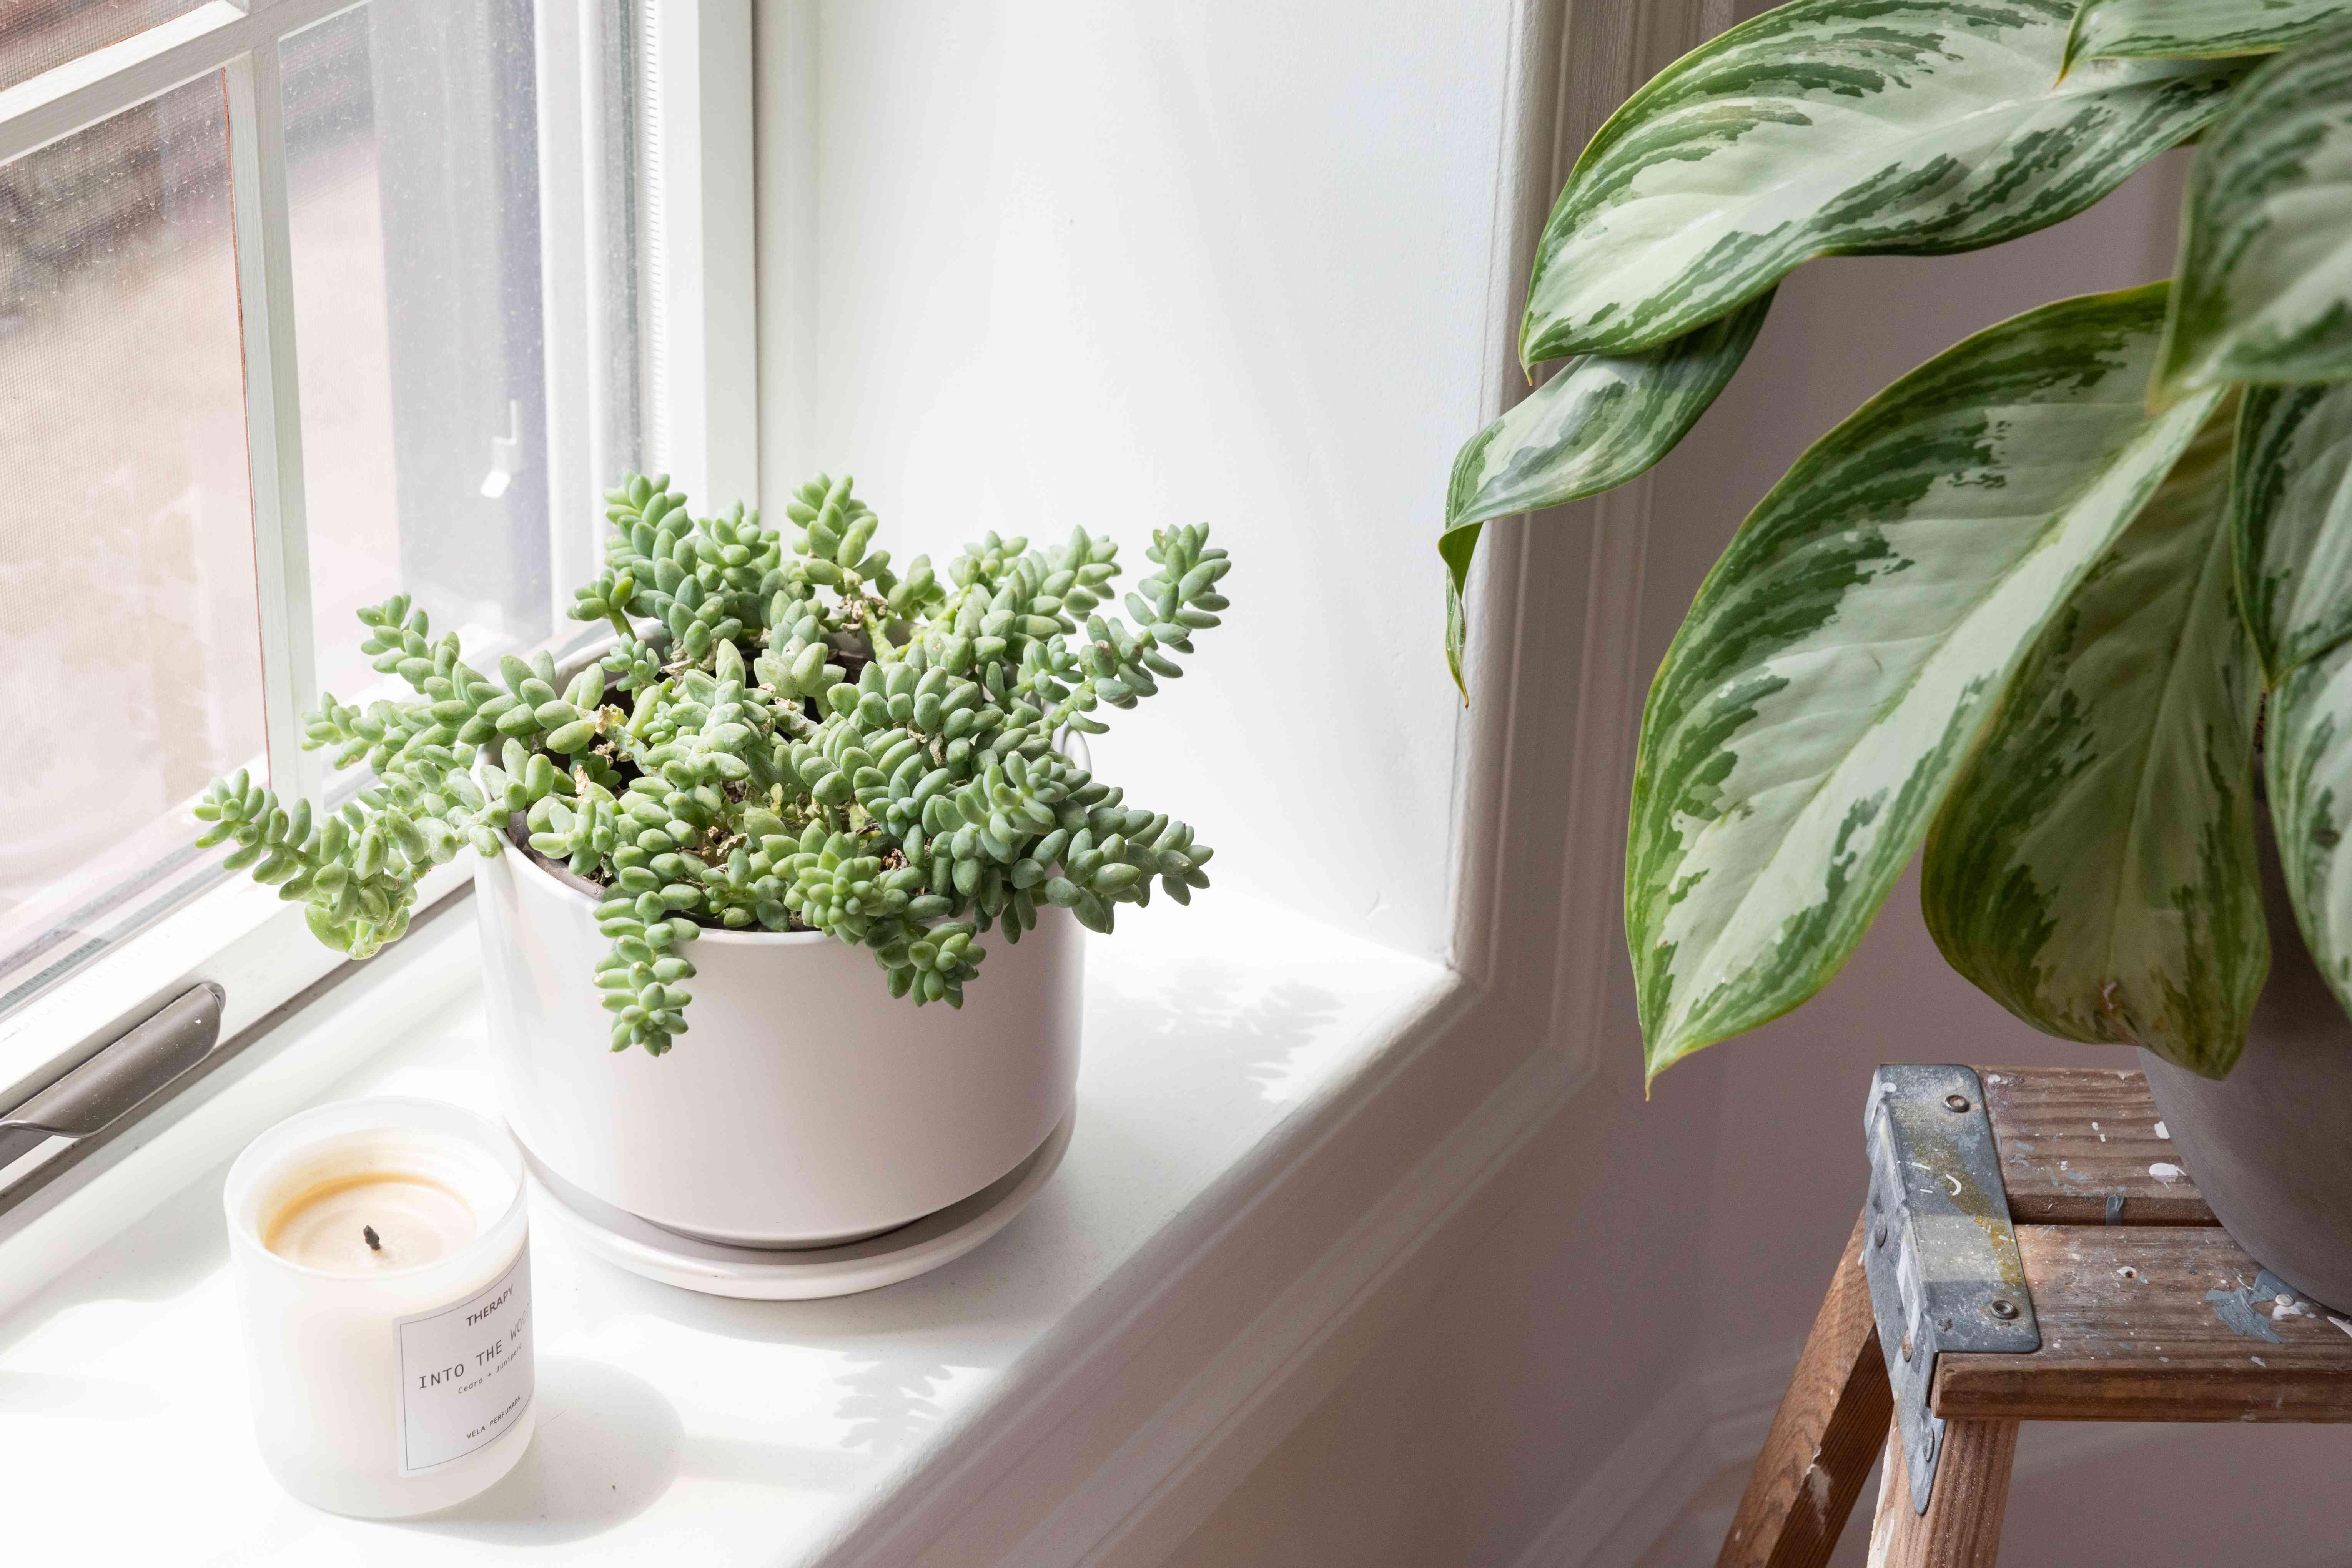 plant on a windowsill in bright direct light